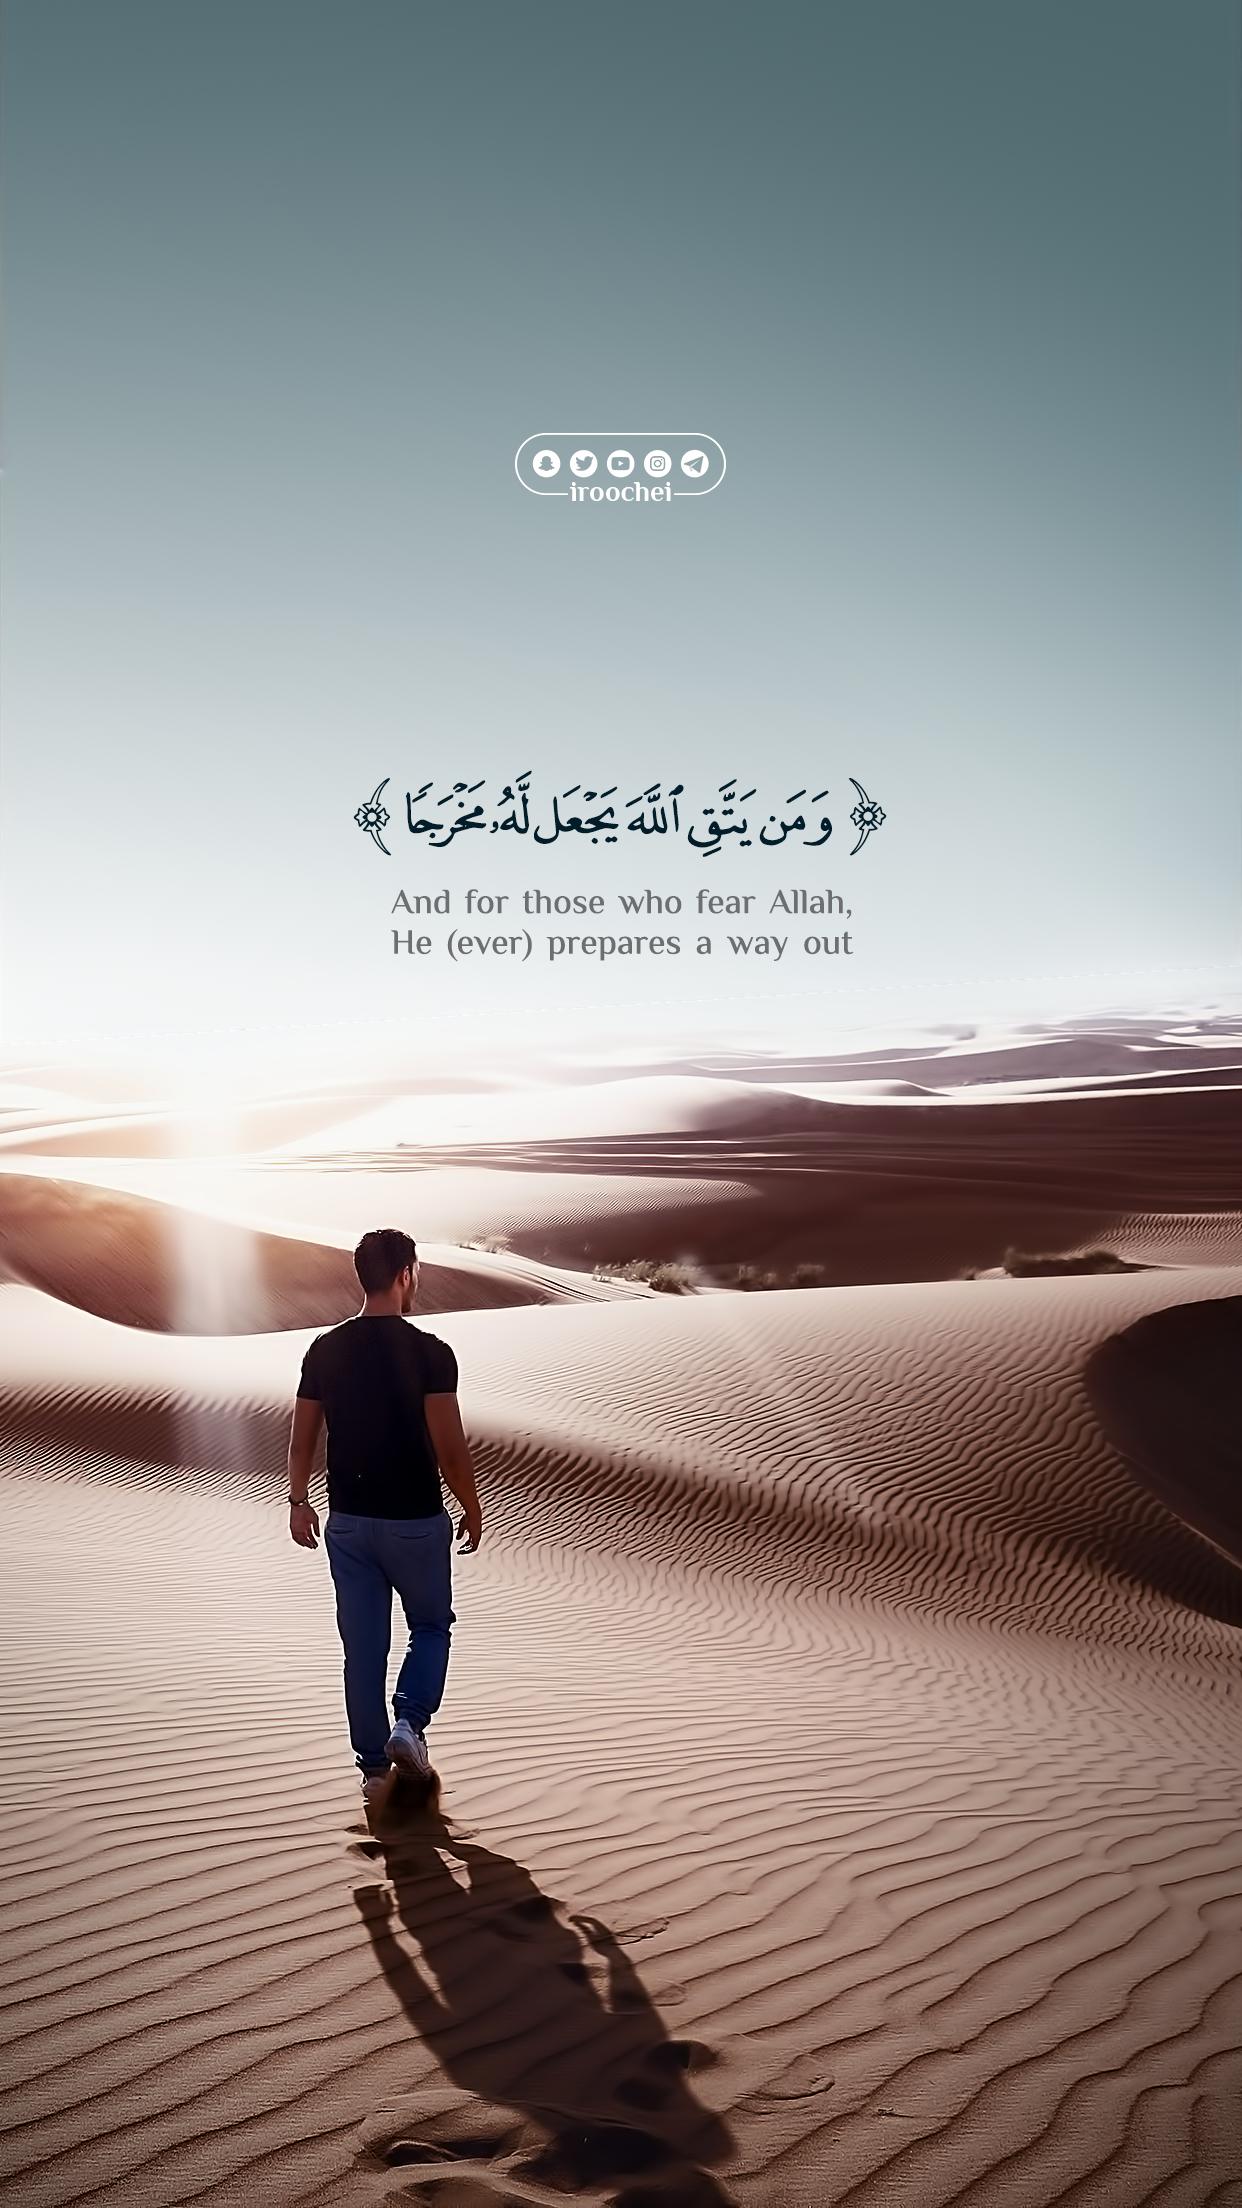 ومن يتق الله يجعل له مخرجا Quran Quotes Verses Beautiful Quran Quotes Quran Quotes